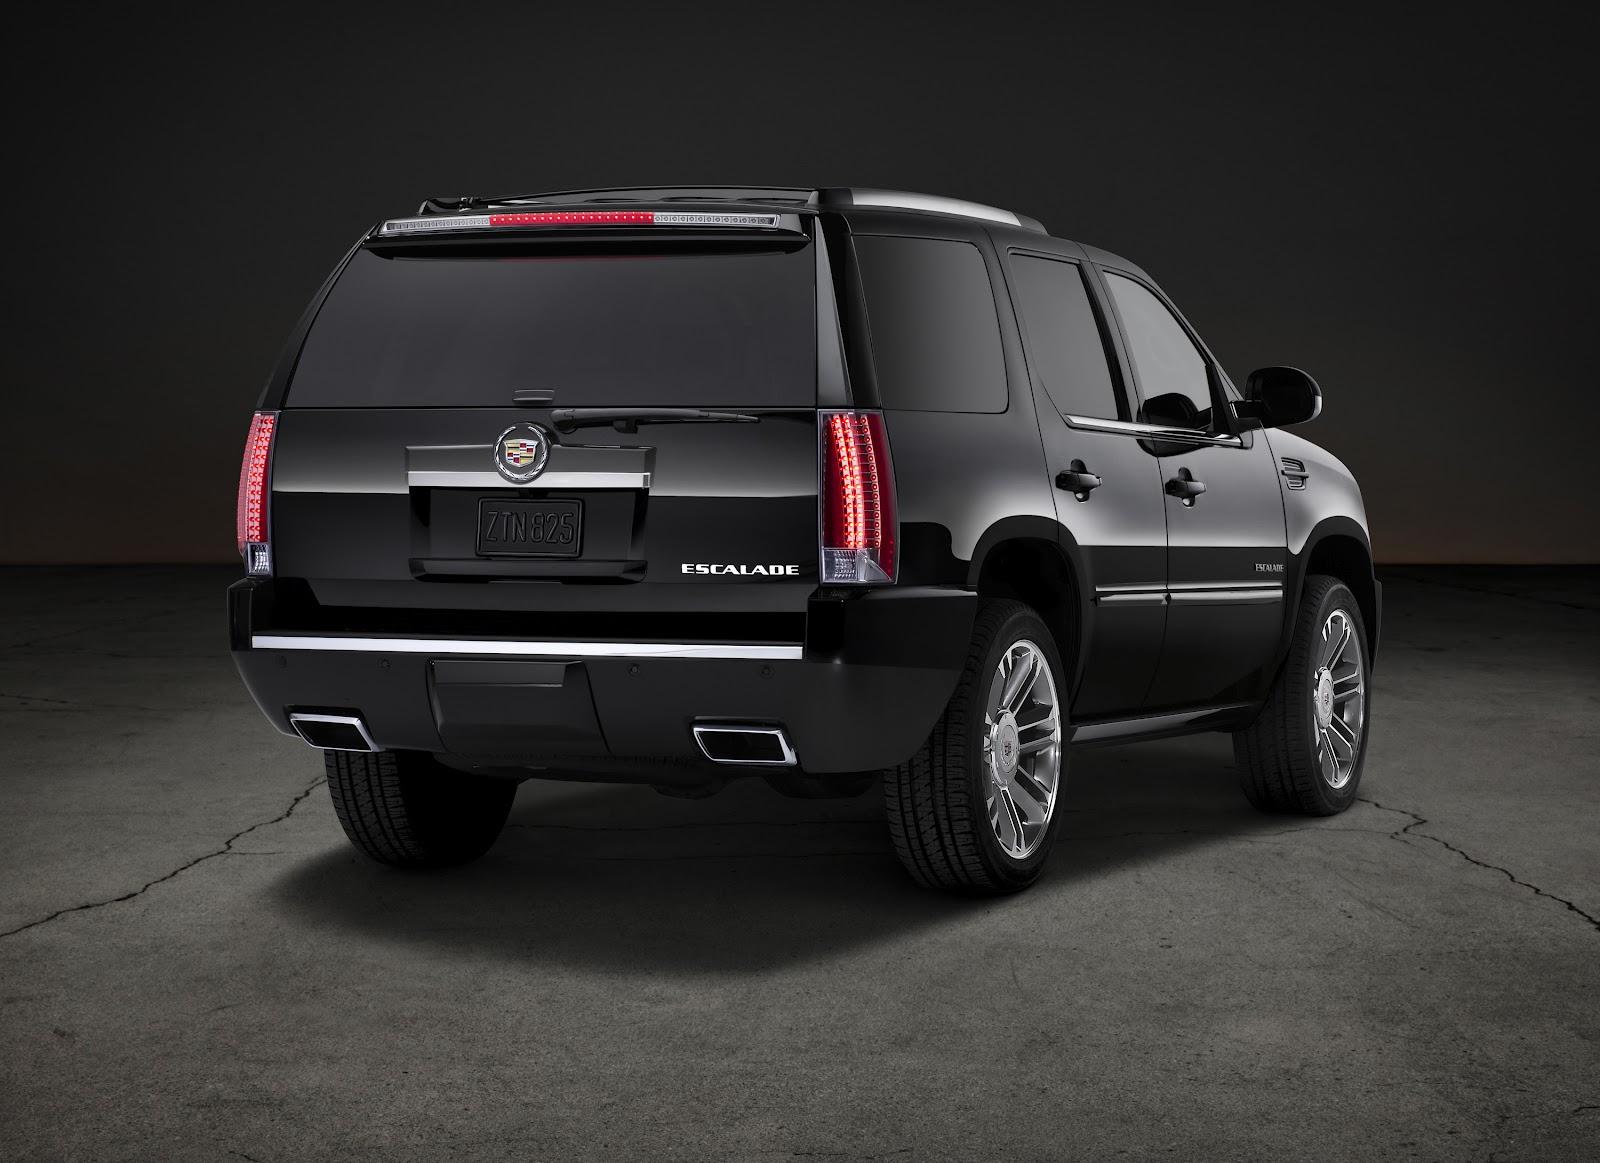 http://3.bp.blogspot.com/-5D6mdYjX5xo/T7zVT_7TdRI/AAAAAAAARB8/B_TR4xnOtv0/s1600/2012+Cadillac+Escalade+Premium+Collection.jpg